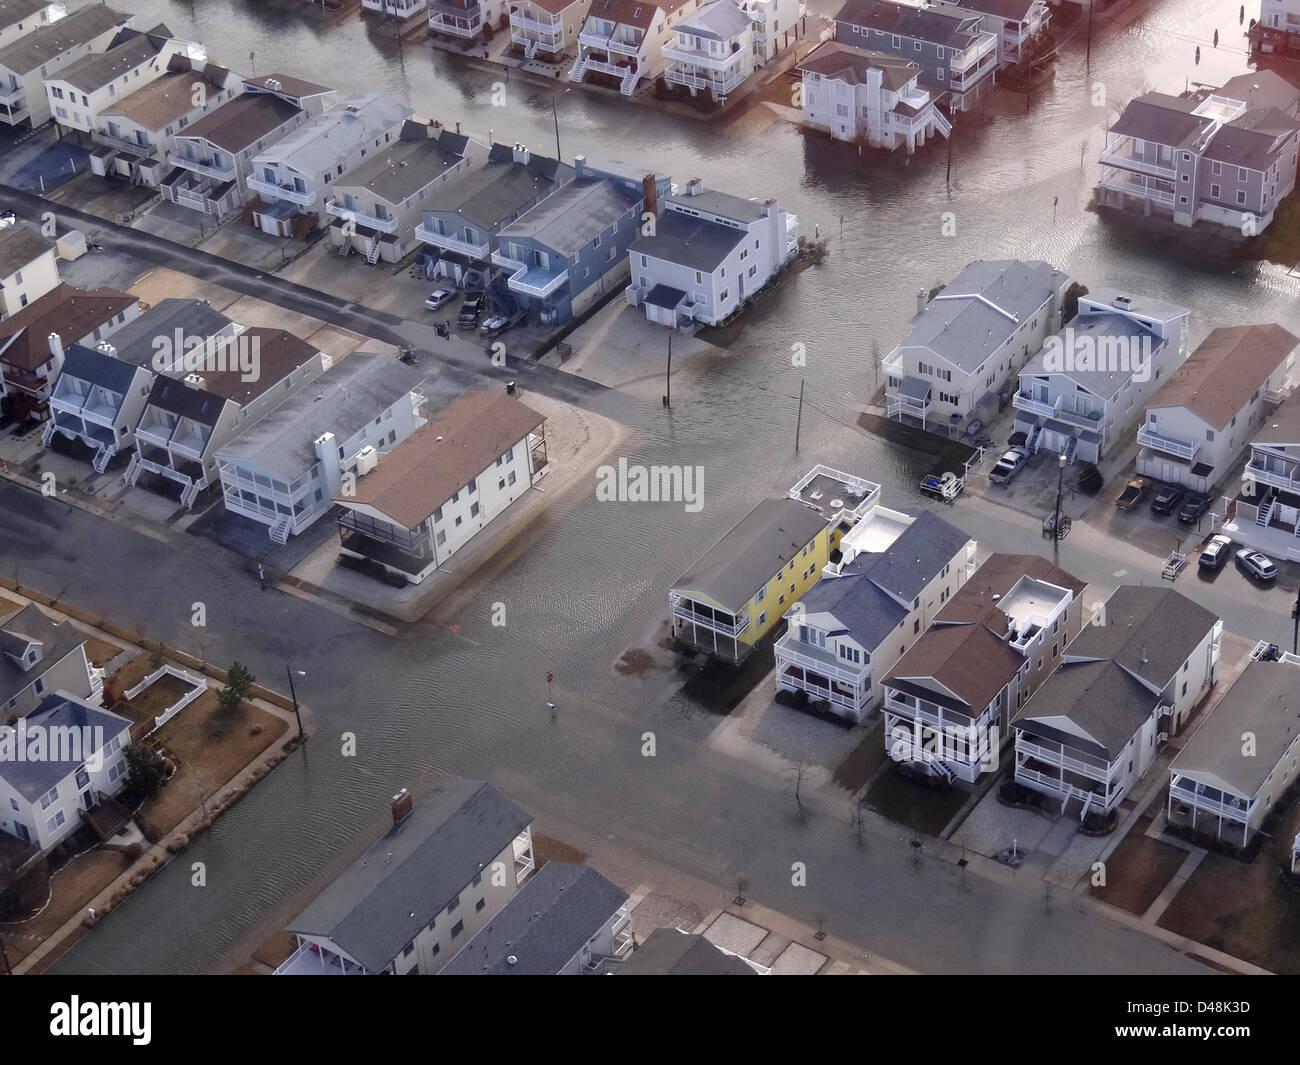 Ocean City Nj Stock Photos & Ocean City Nj Stock Images - Alamy